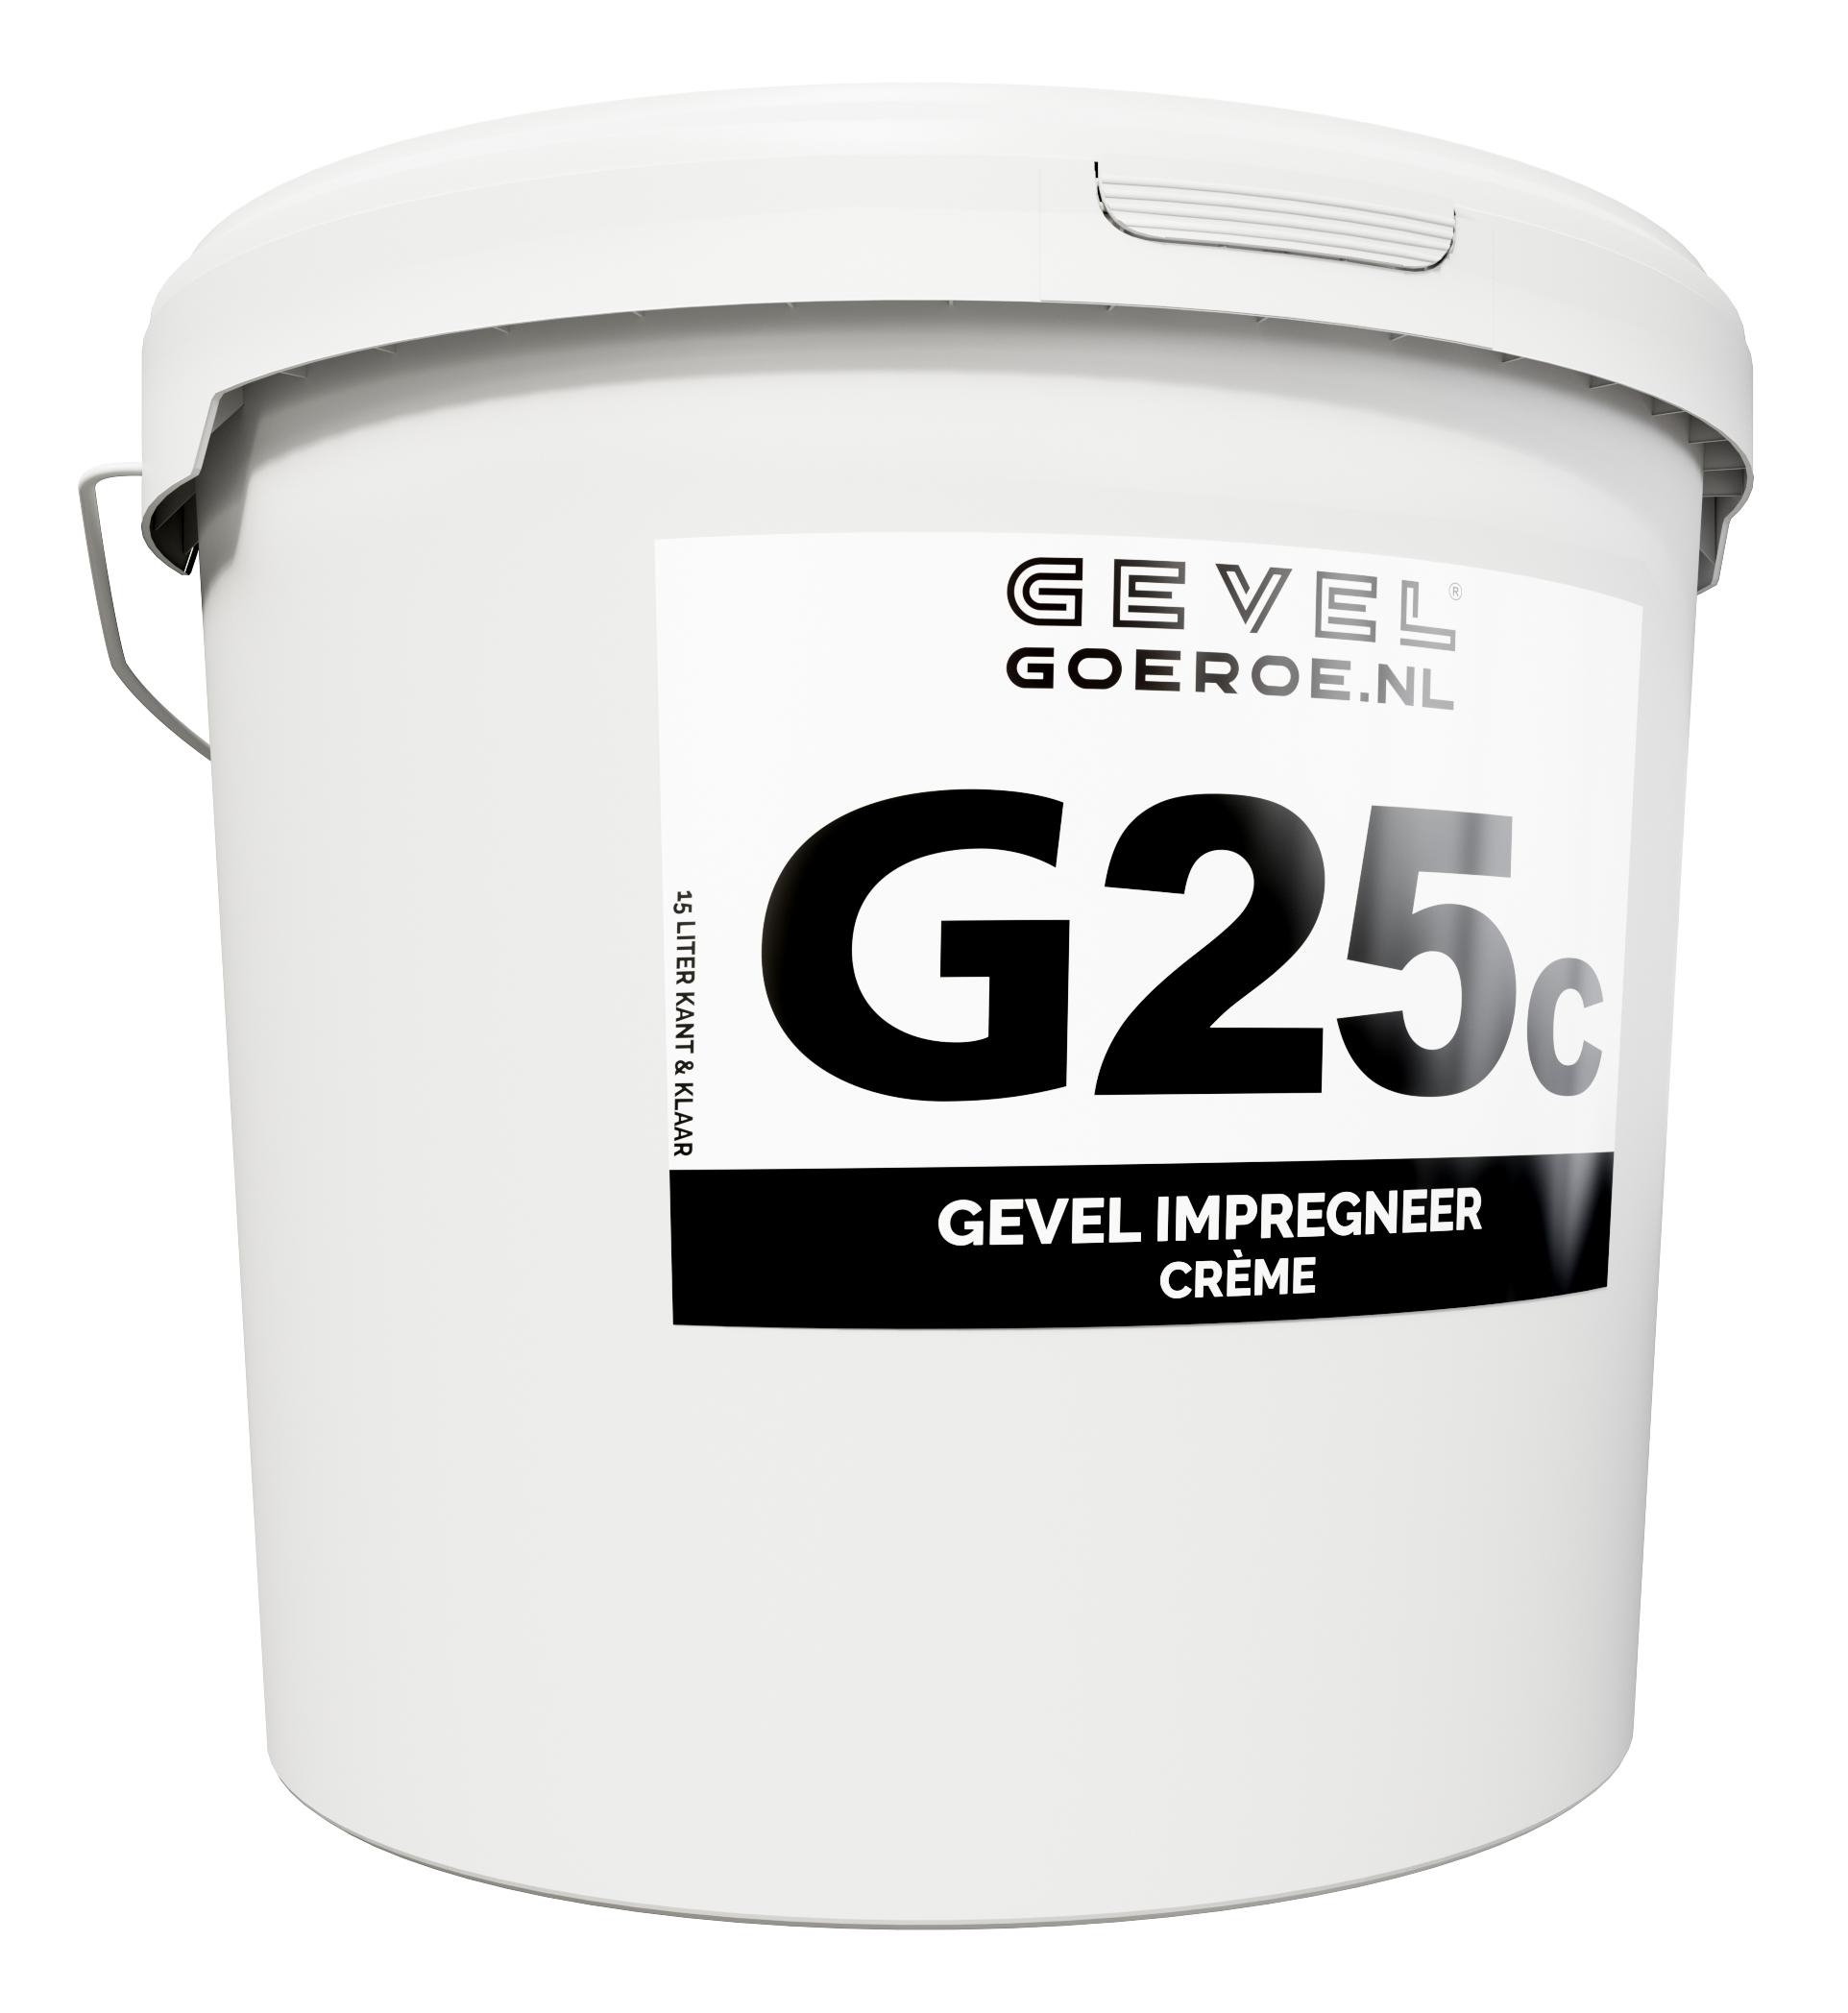 G25c - Gevel Impregneer Creme 15L